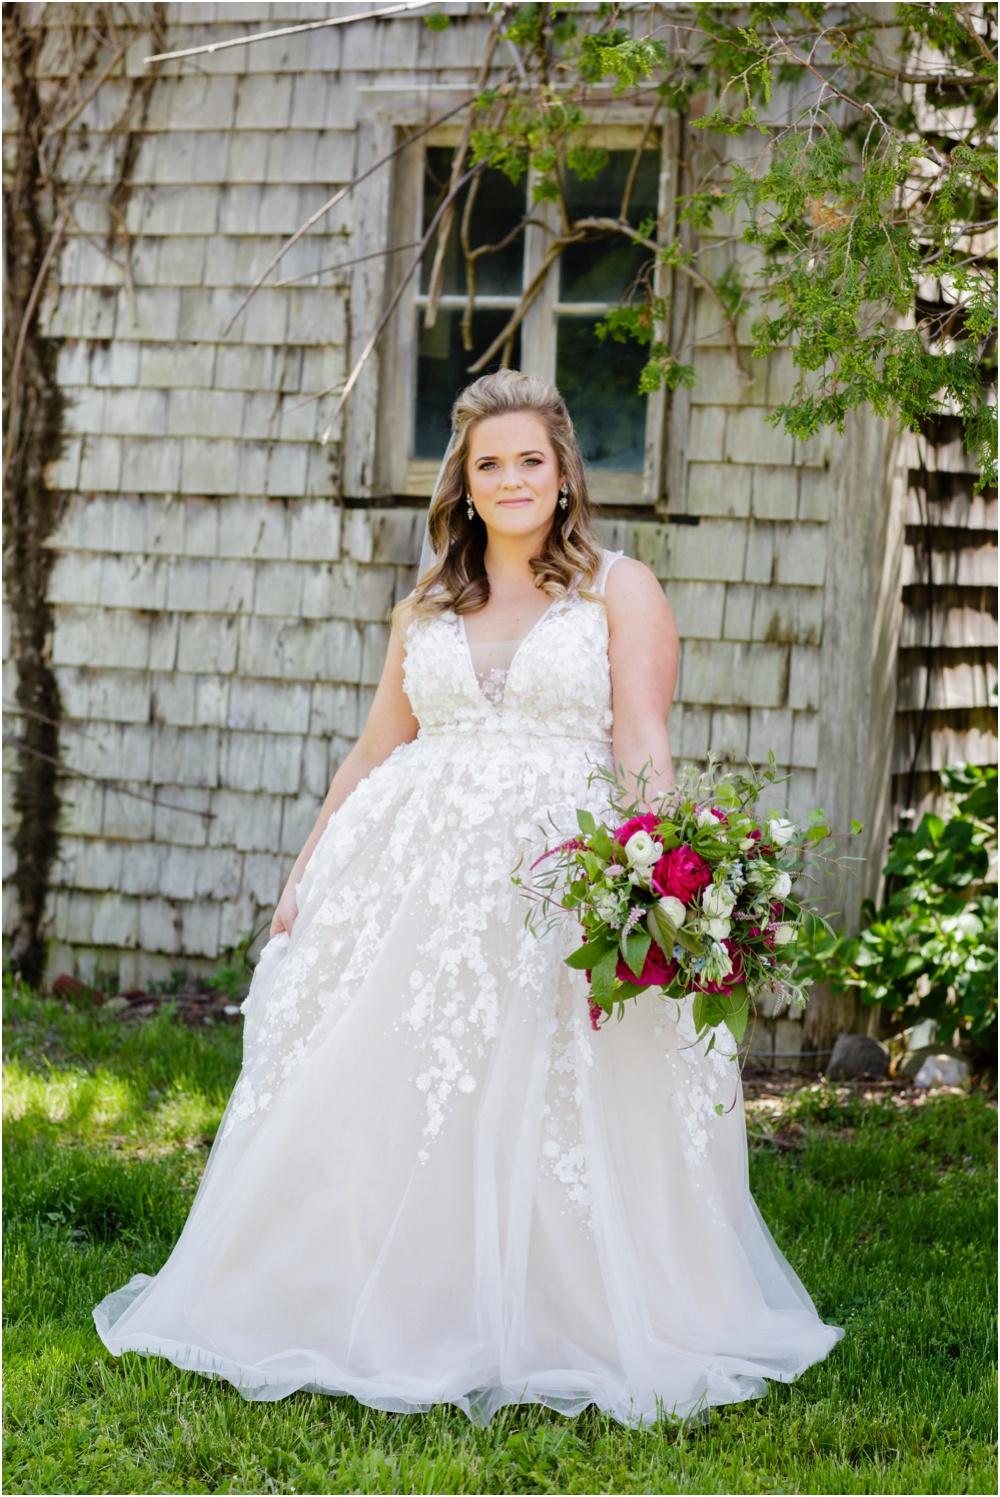 RI-Wedding-Photographer-Lefebvre-Photo-Blog_3358.jpg